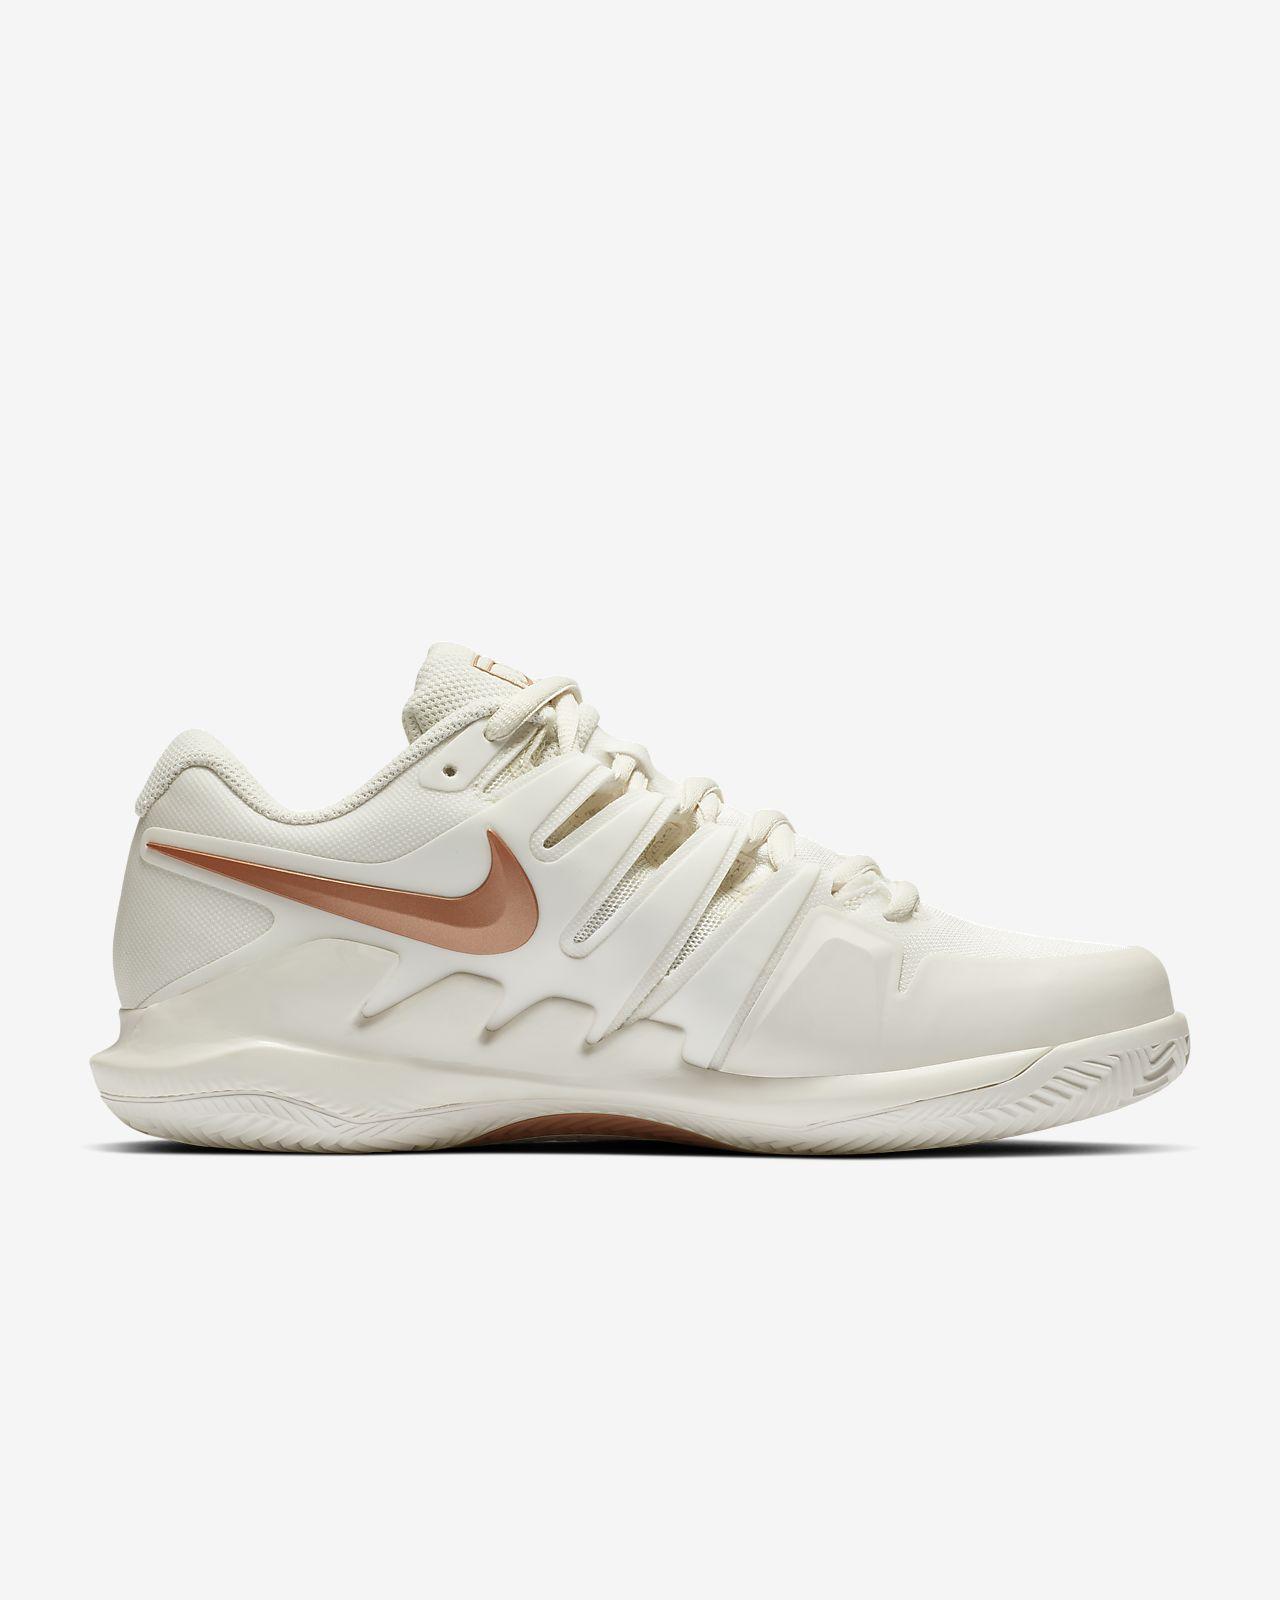 NikeCourt Air Zoom Vapor X Damen Tennisschuh für Sandplätze